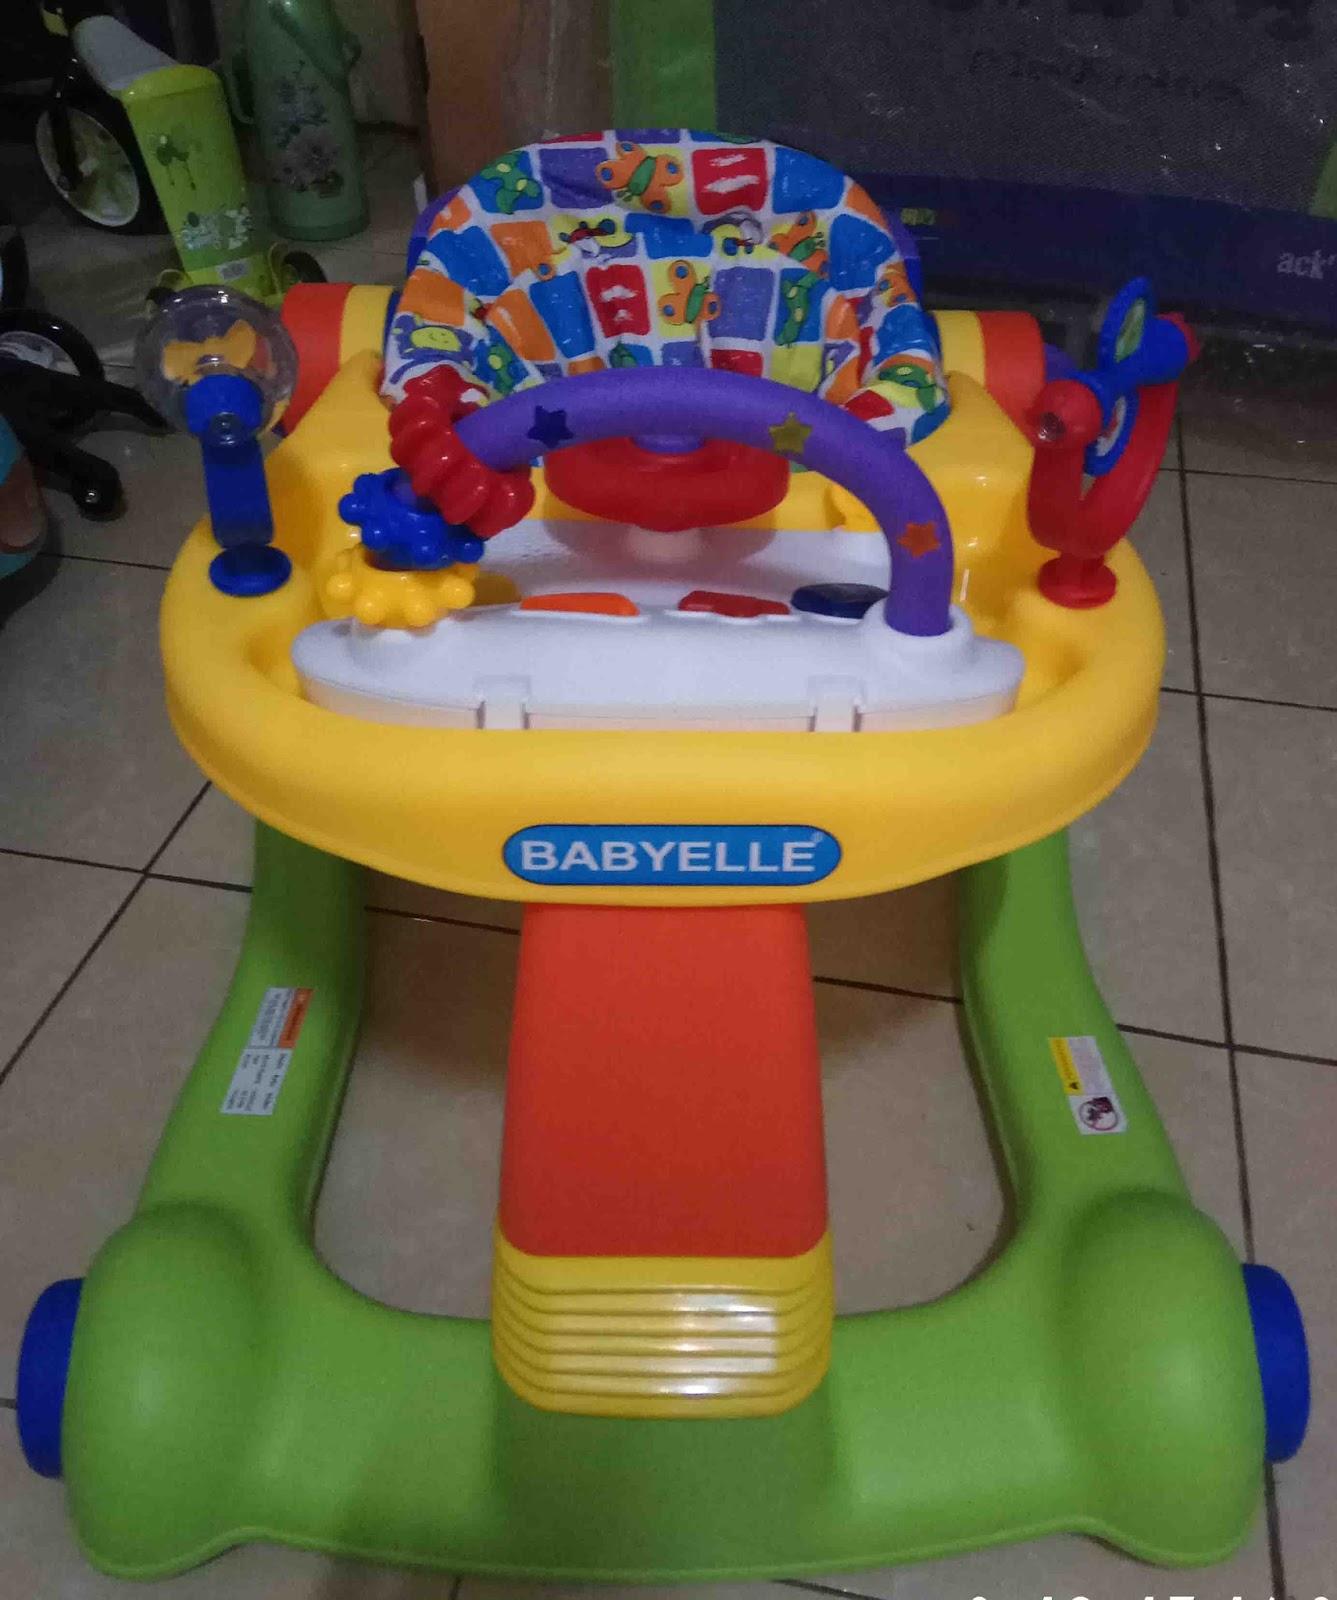 Joyo toys menyewakan perlengkapan bayi berbagai macam perlengkapan dan berbagai mainan anak Menyediakan juga untuk event anak